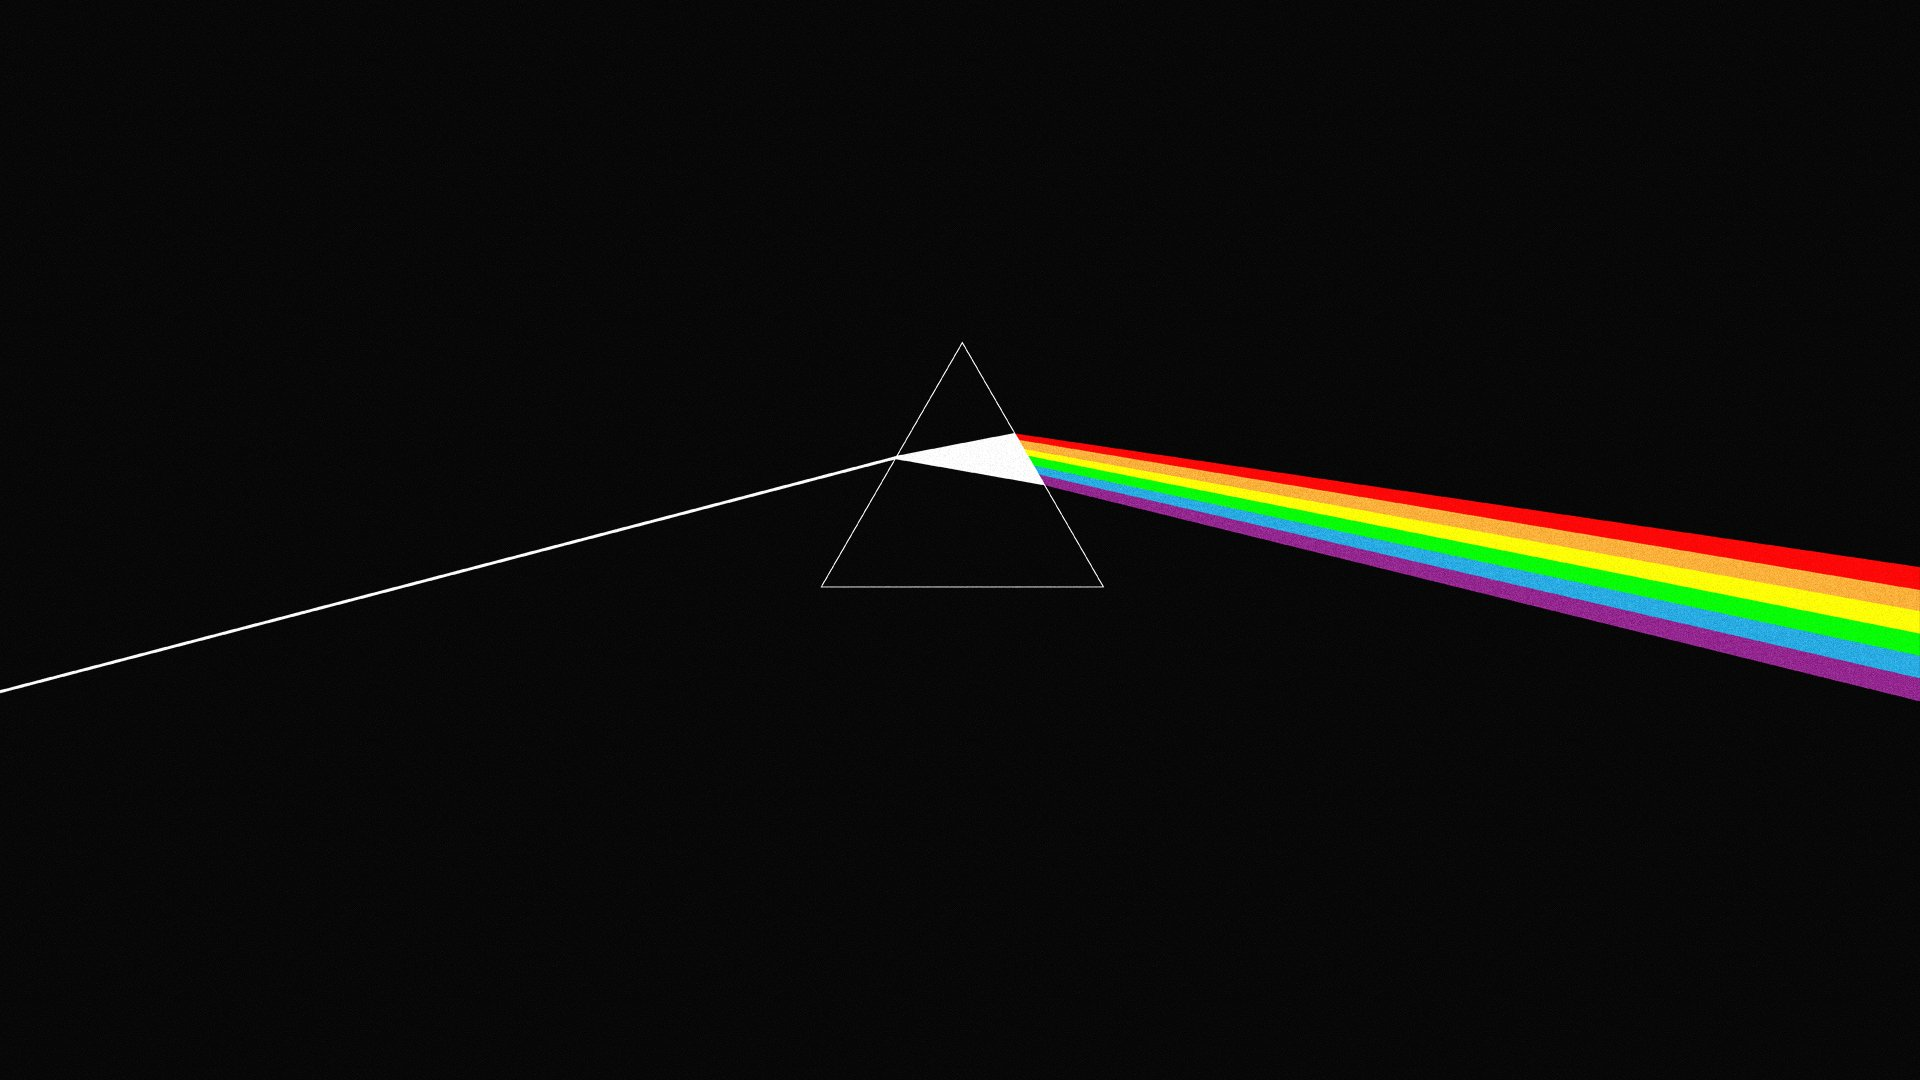 Pink Floyd HD Wallpapers - WallpaperSafari